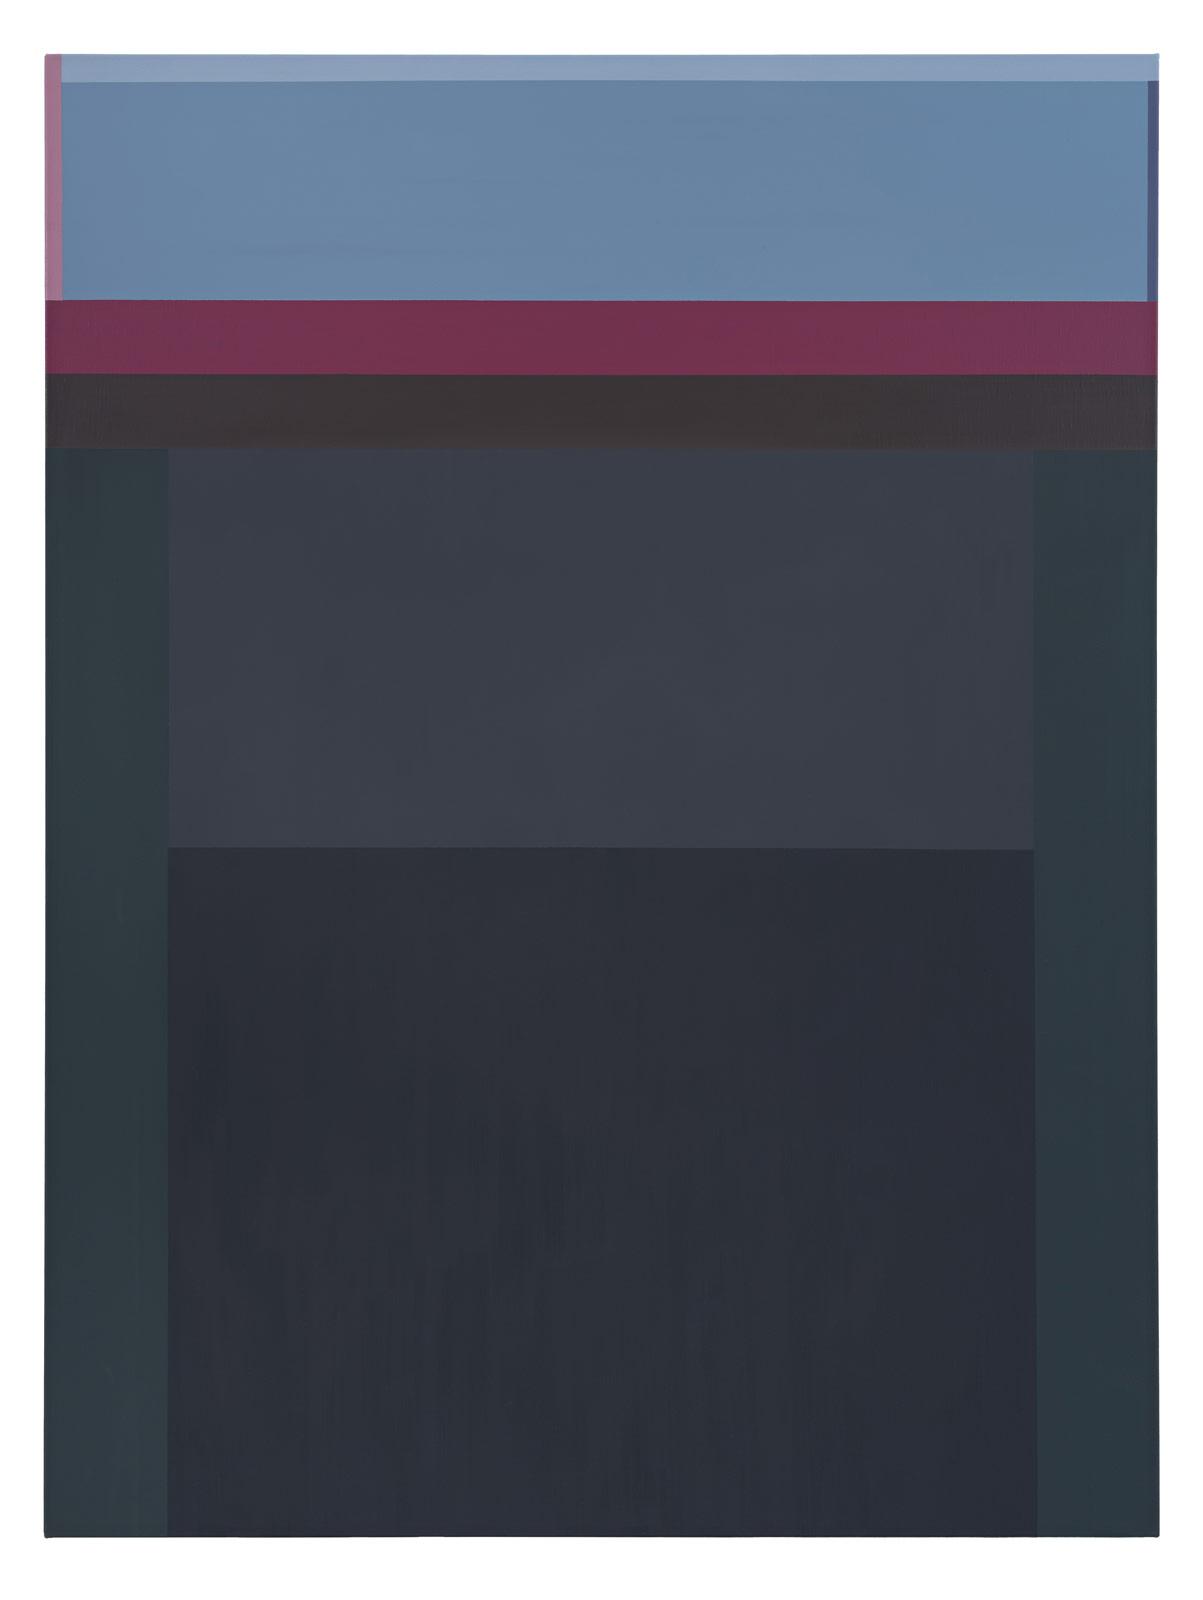 Altaret, 2018. Oil on canvas, 120 x 90 x 2,5 cm